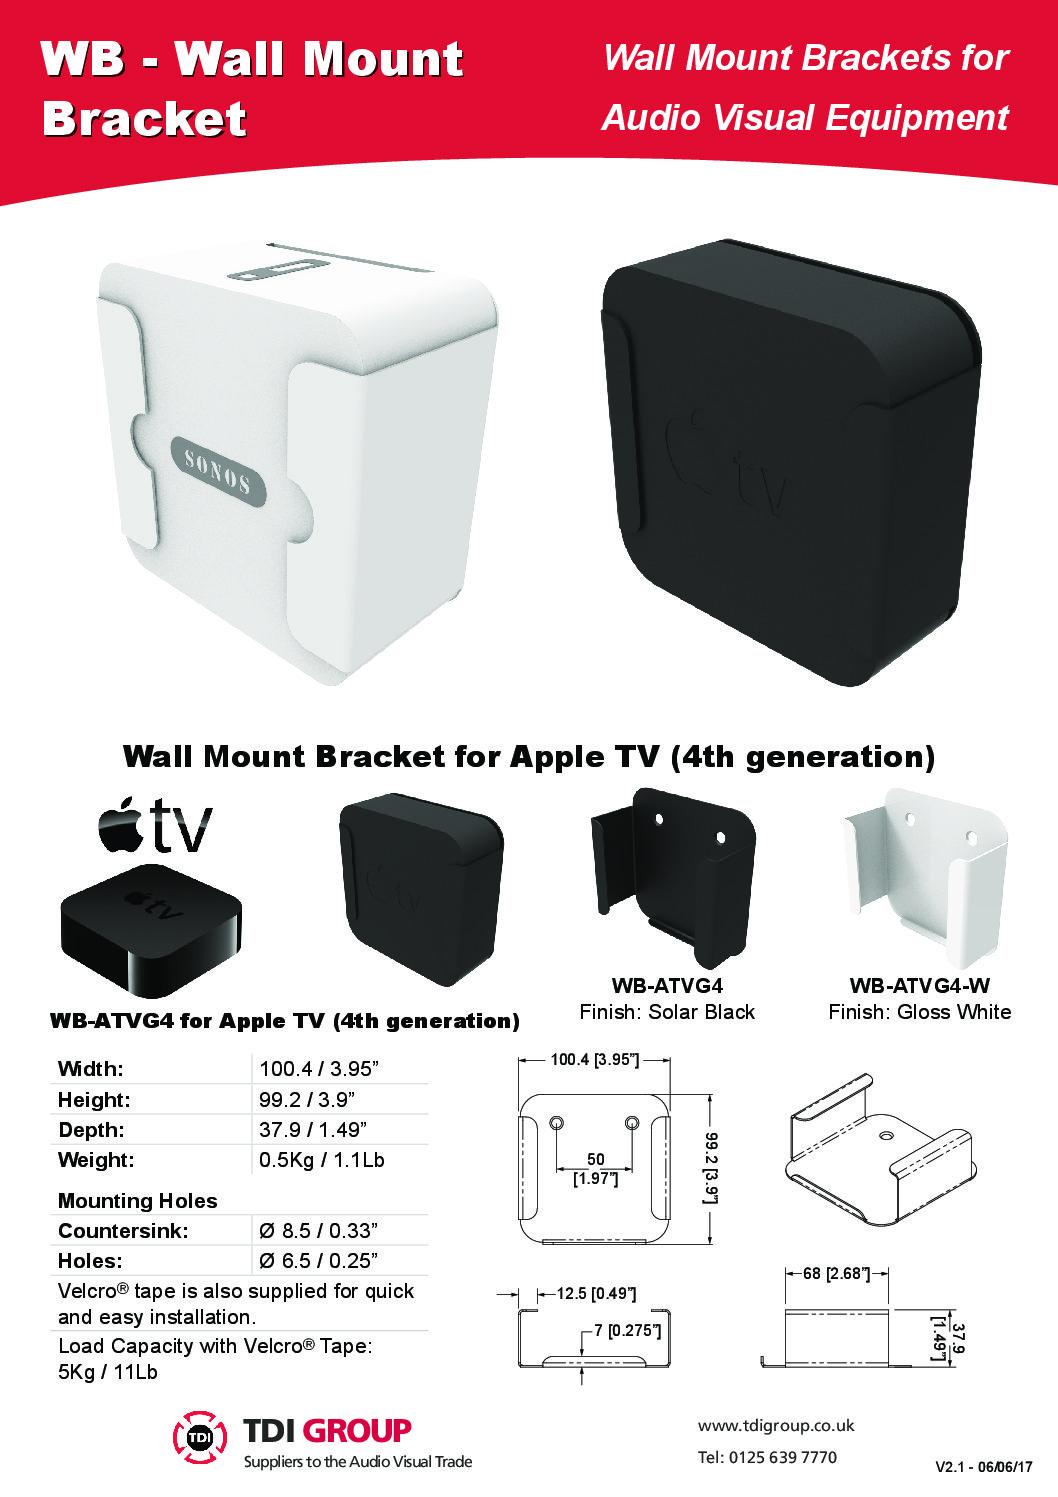 Wall Mount Bracket For Sky Q Mini Box Tdigroup